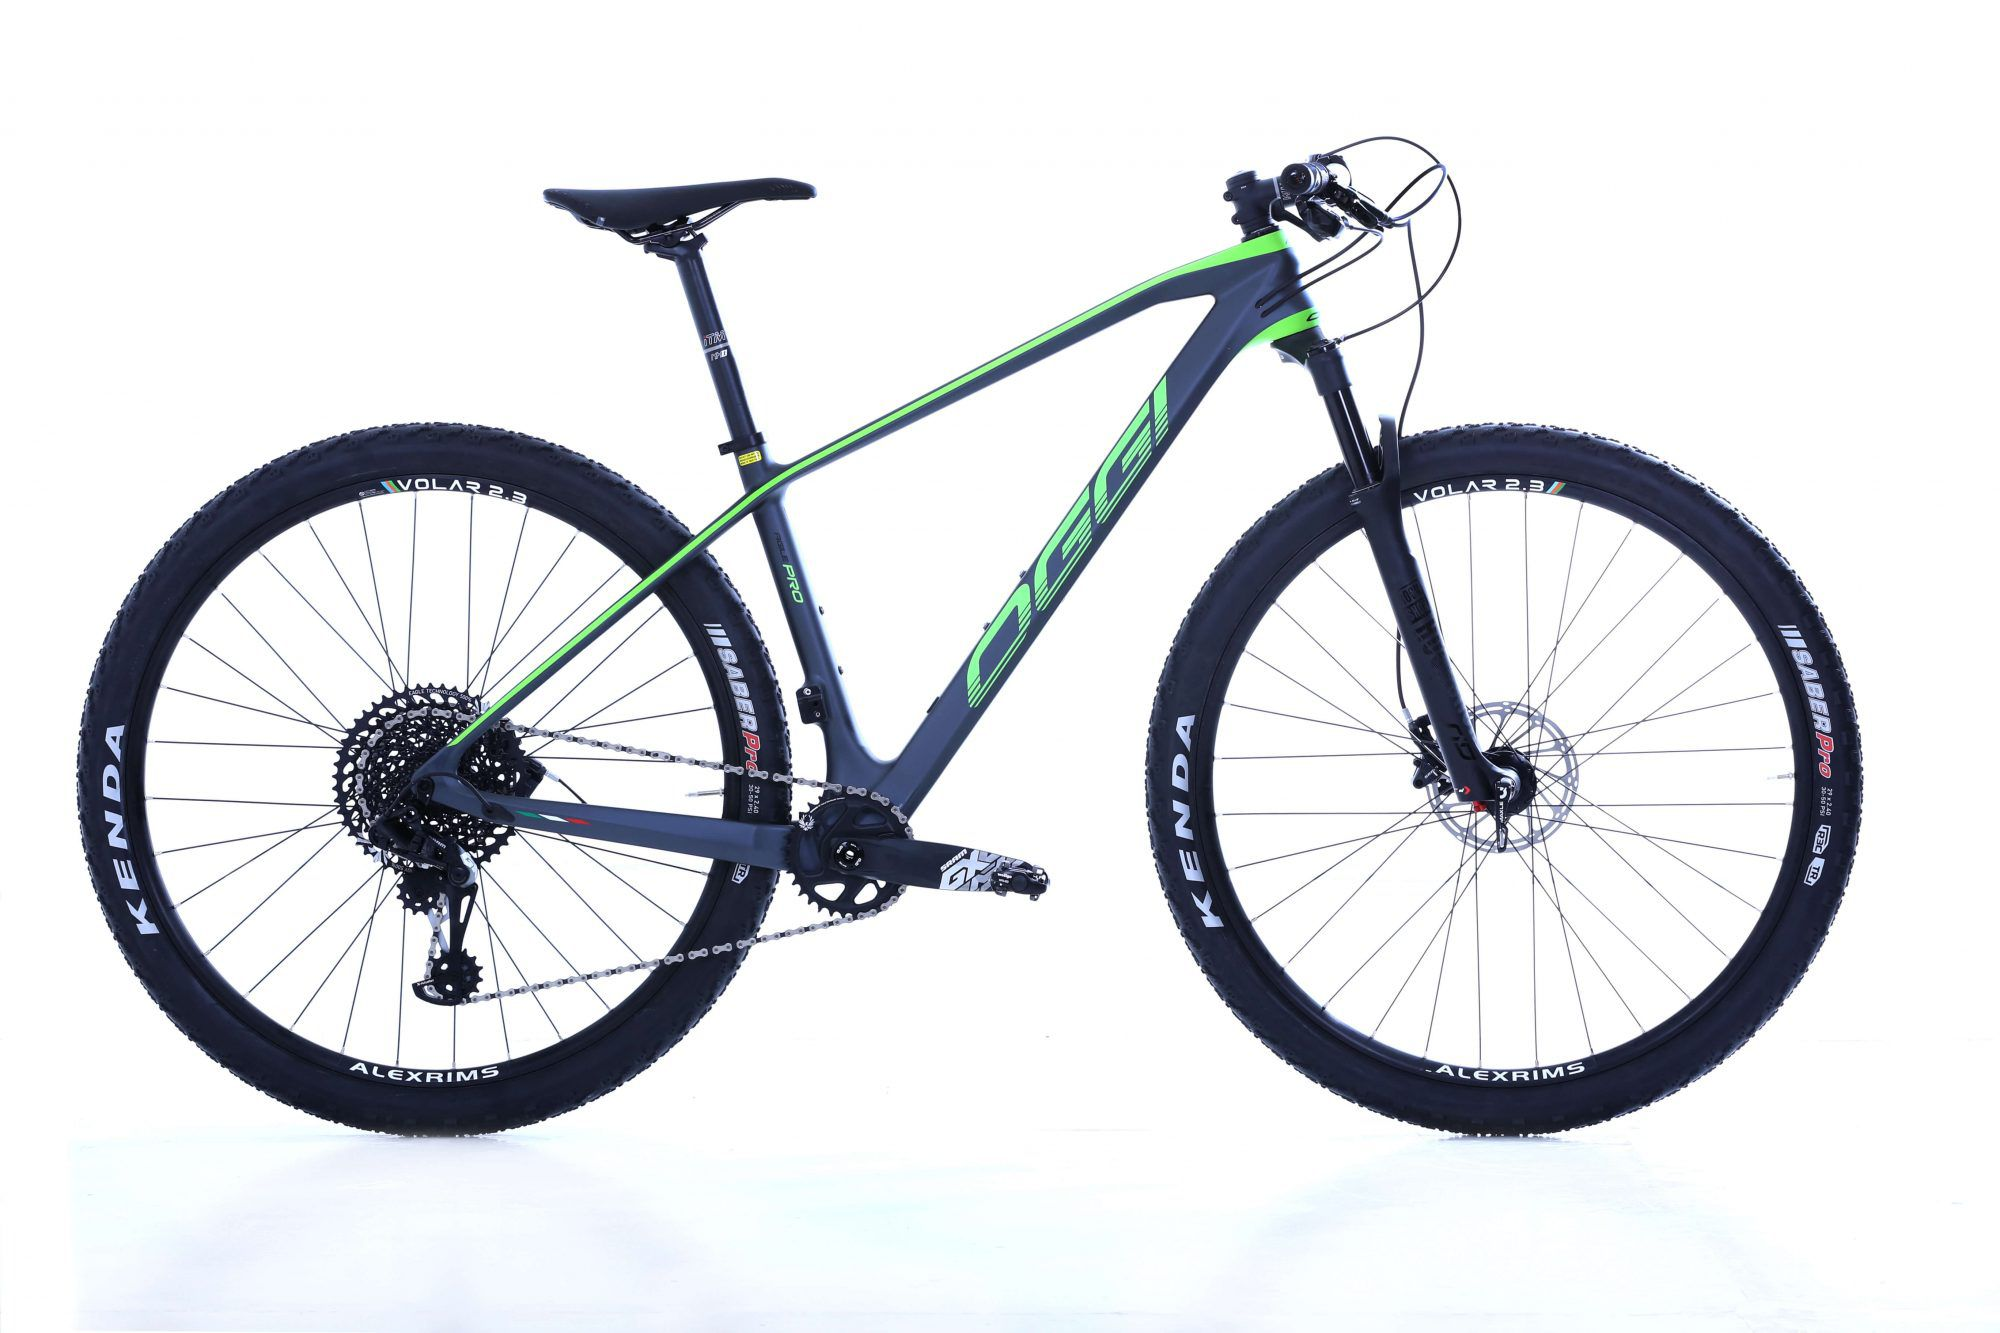 Bicicleta OGGI AGILE PRO CARBON 2019 SRAM GX 12V VERDE